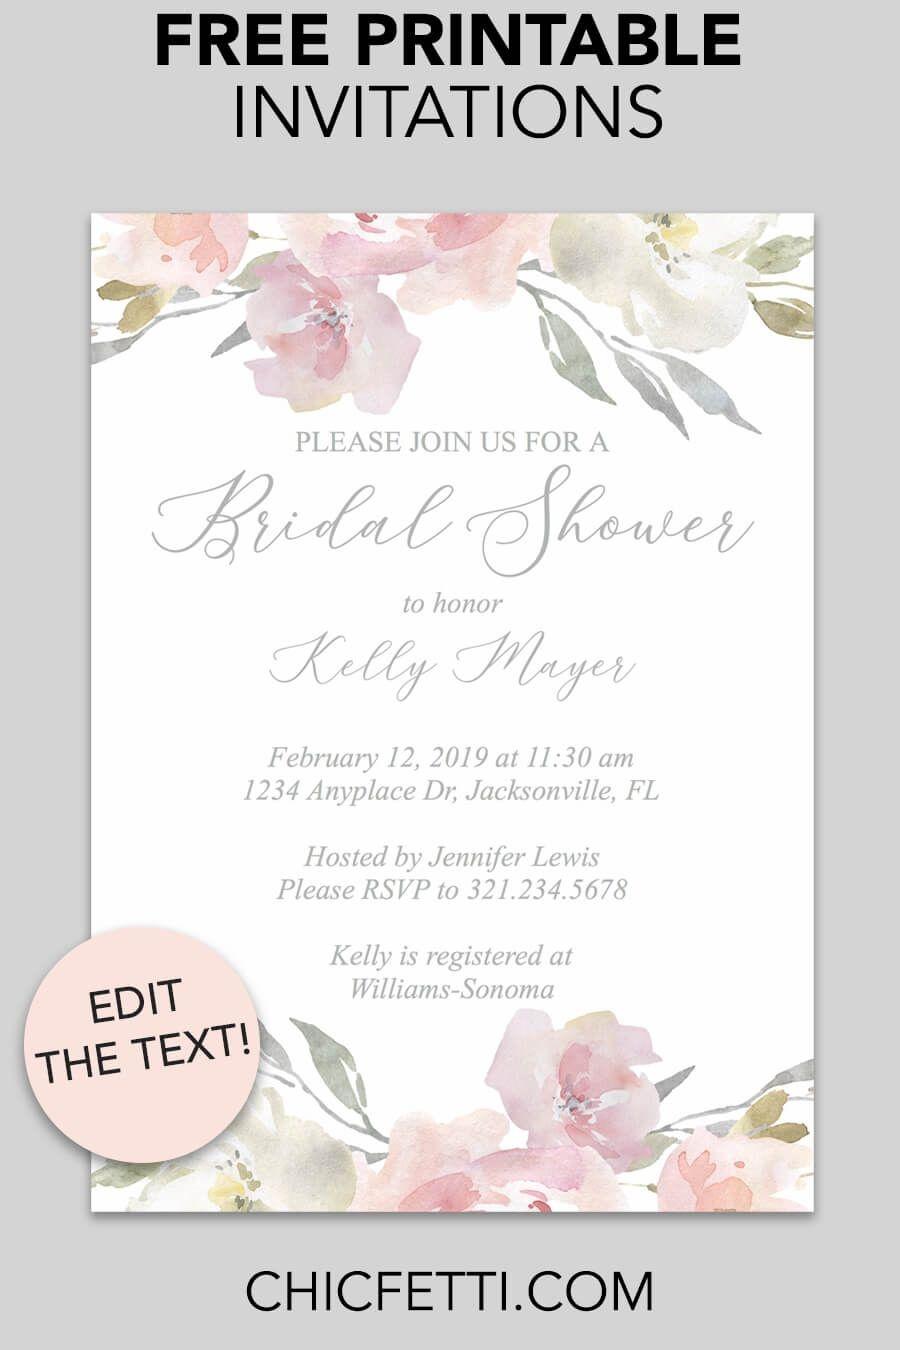 Bridal Shower Printable Invitation (Blush Floral   Invitations - Invitations Bridal Shower Free Printable